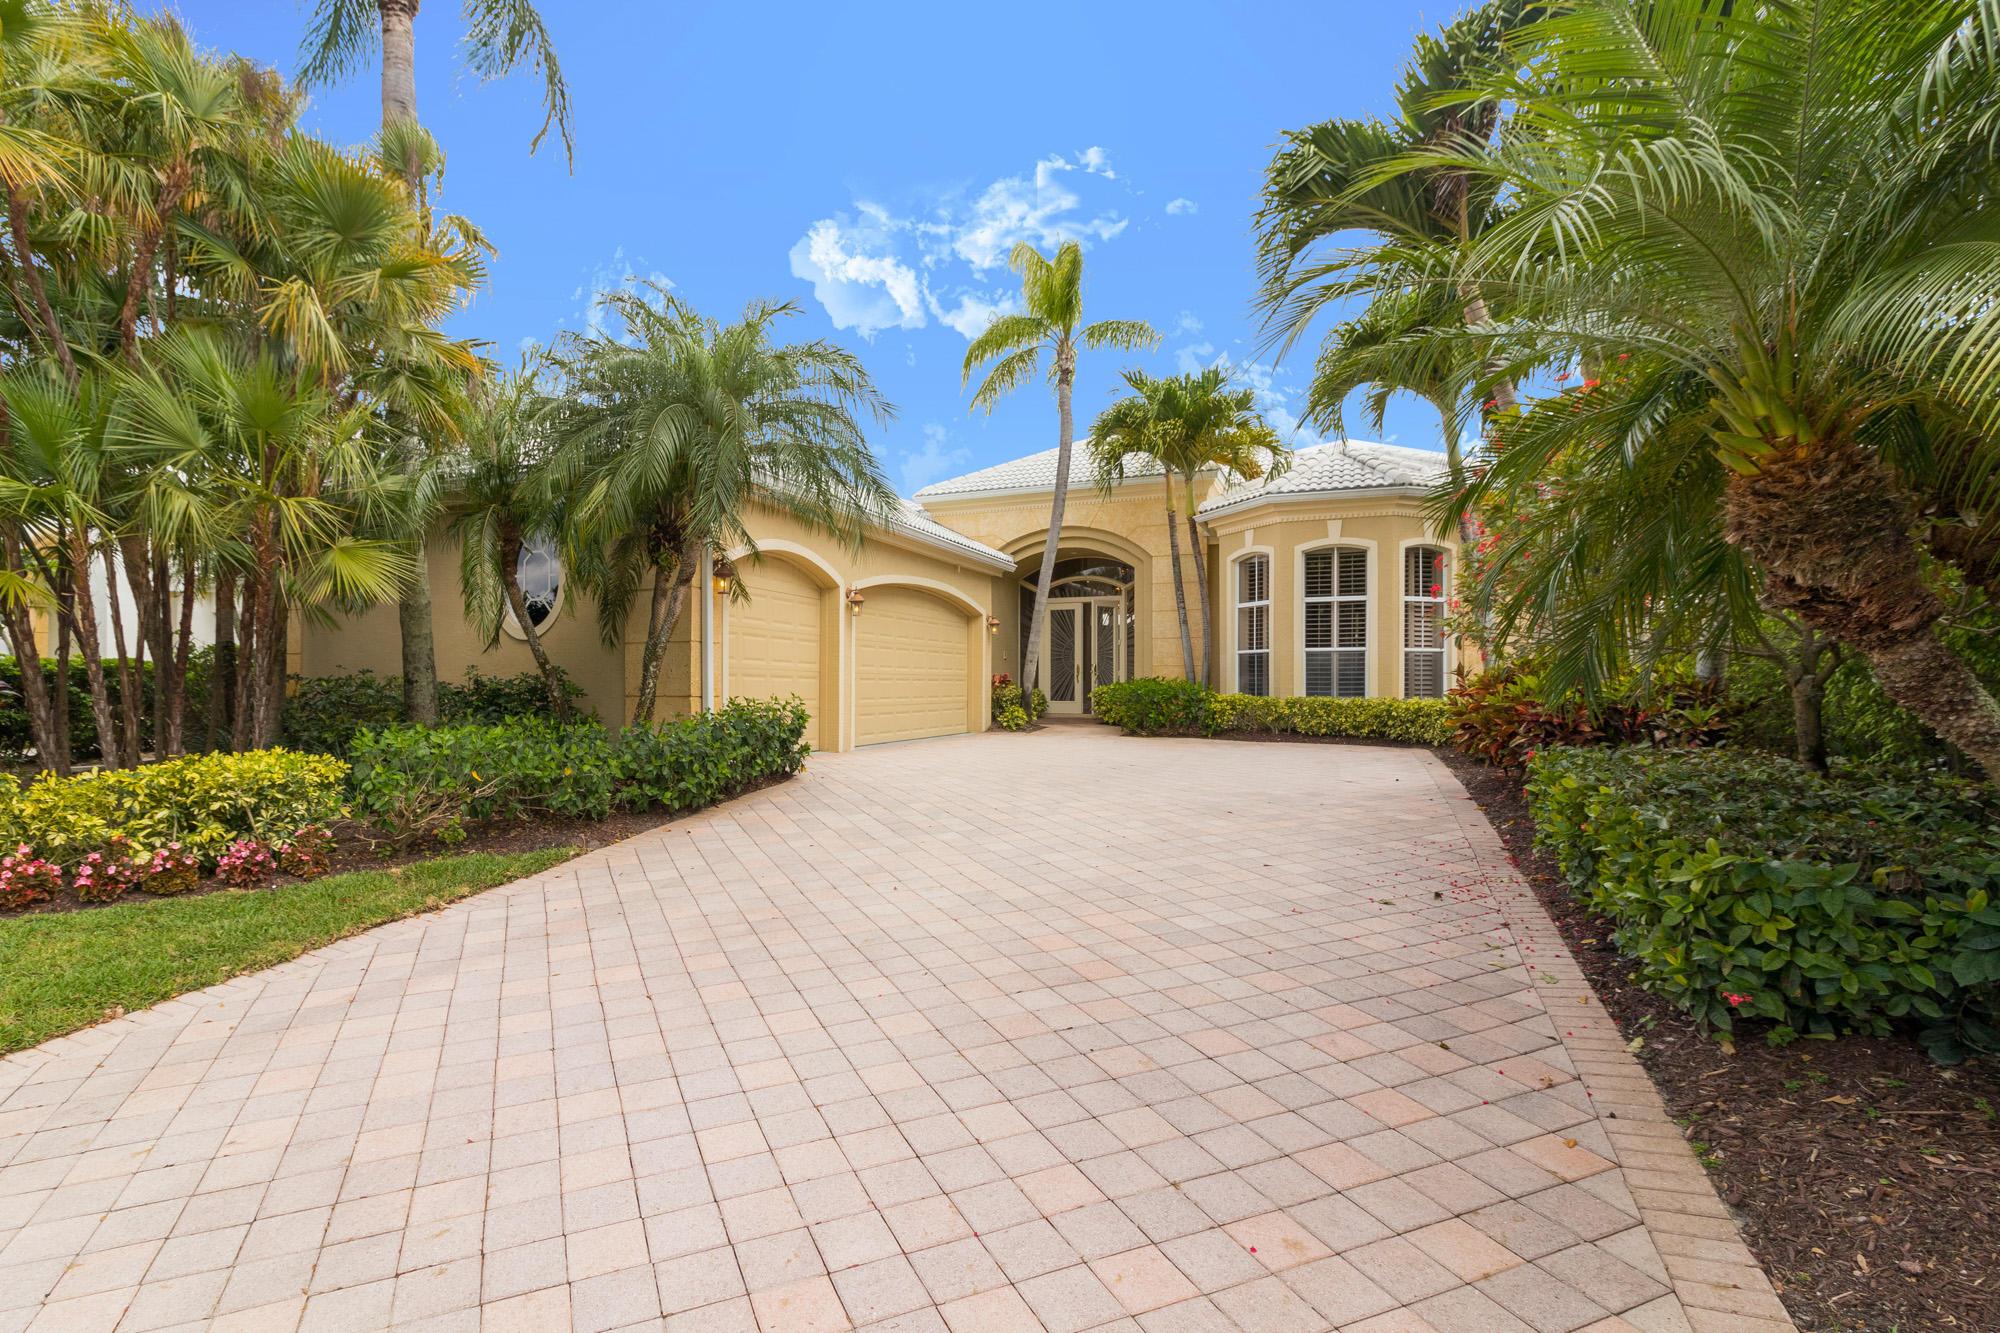 1136 Crystal Drive, Palm Beach Gardens, Florida 33418, 4 Bedrooms Bedrooms, ,5 BathroomsBathrooms,F,Single family,Crystal,RX-10605035